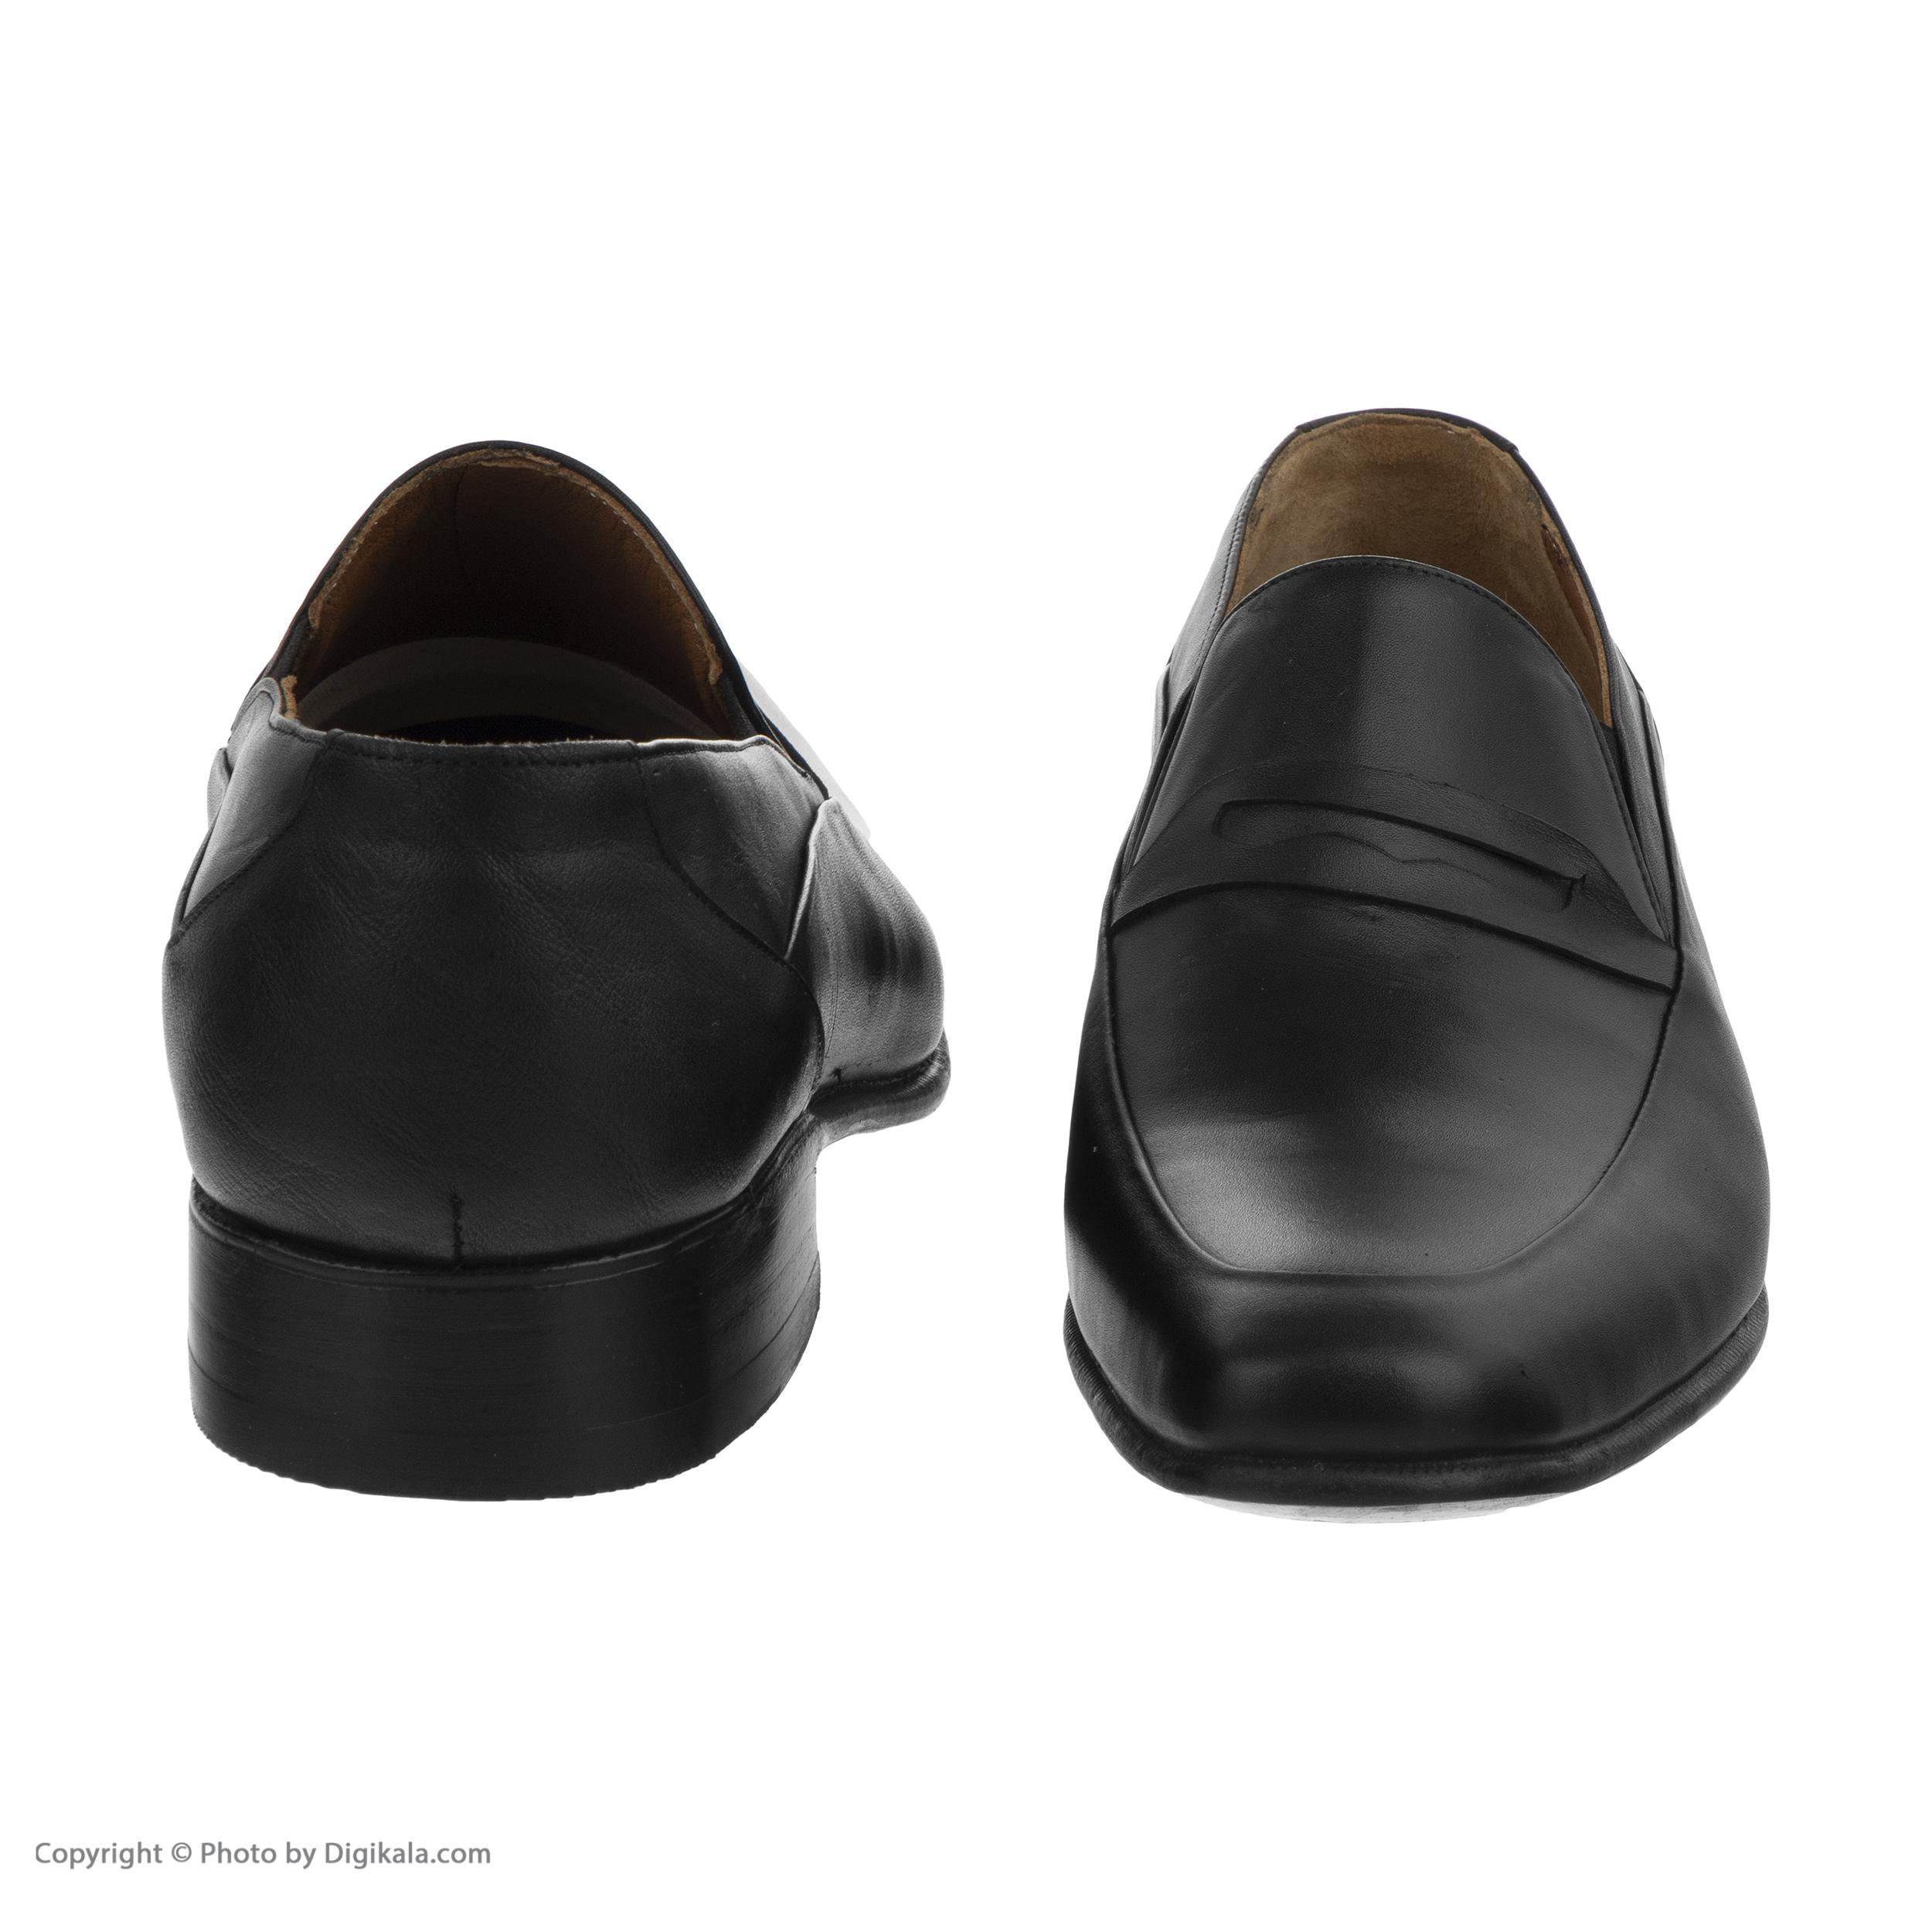 کفش مردانه نظری کد 421 -  - 2